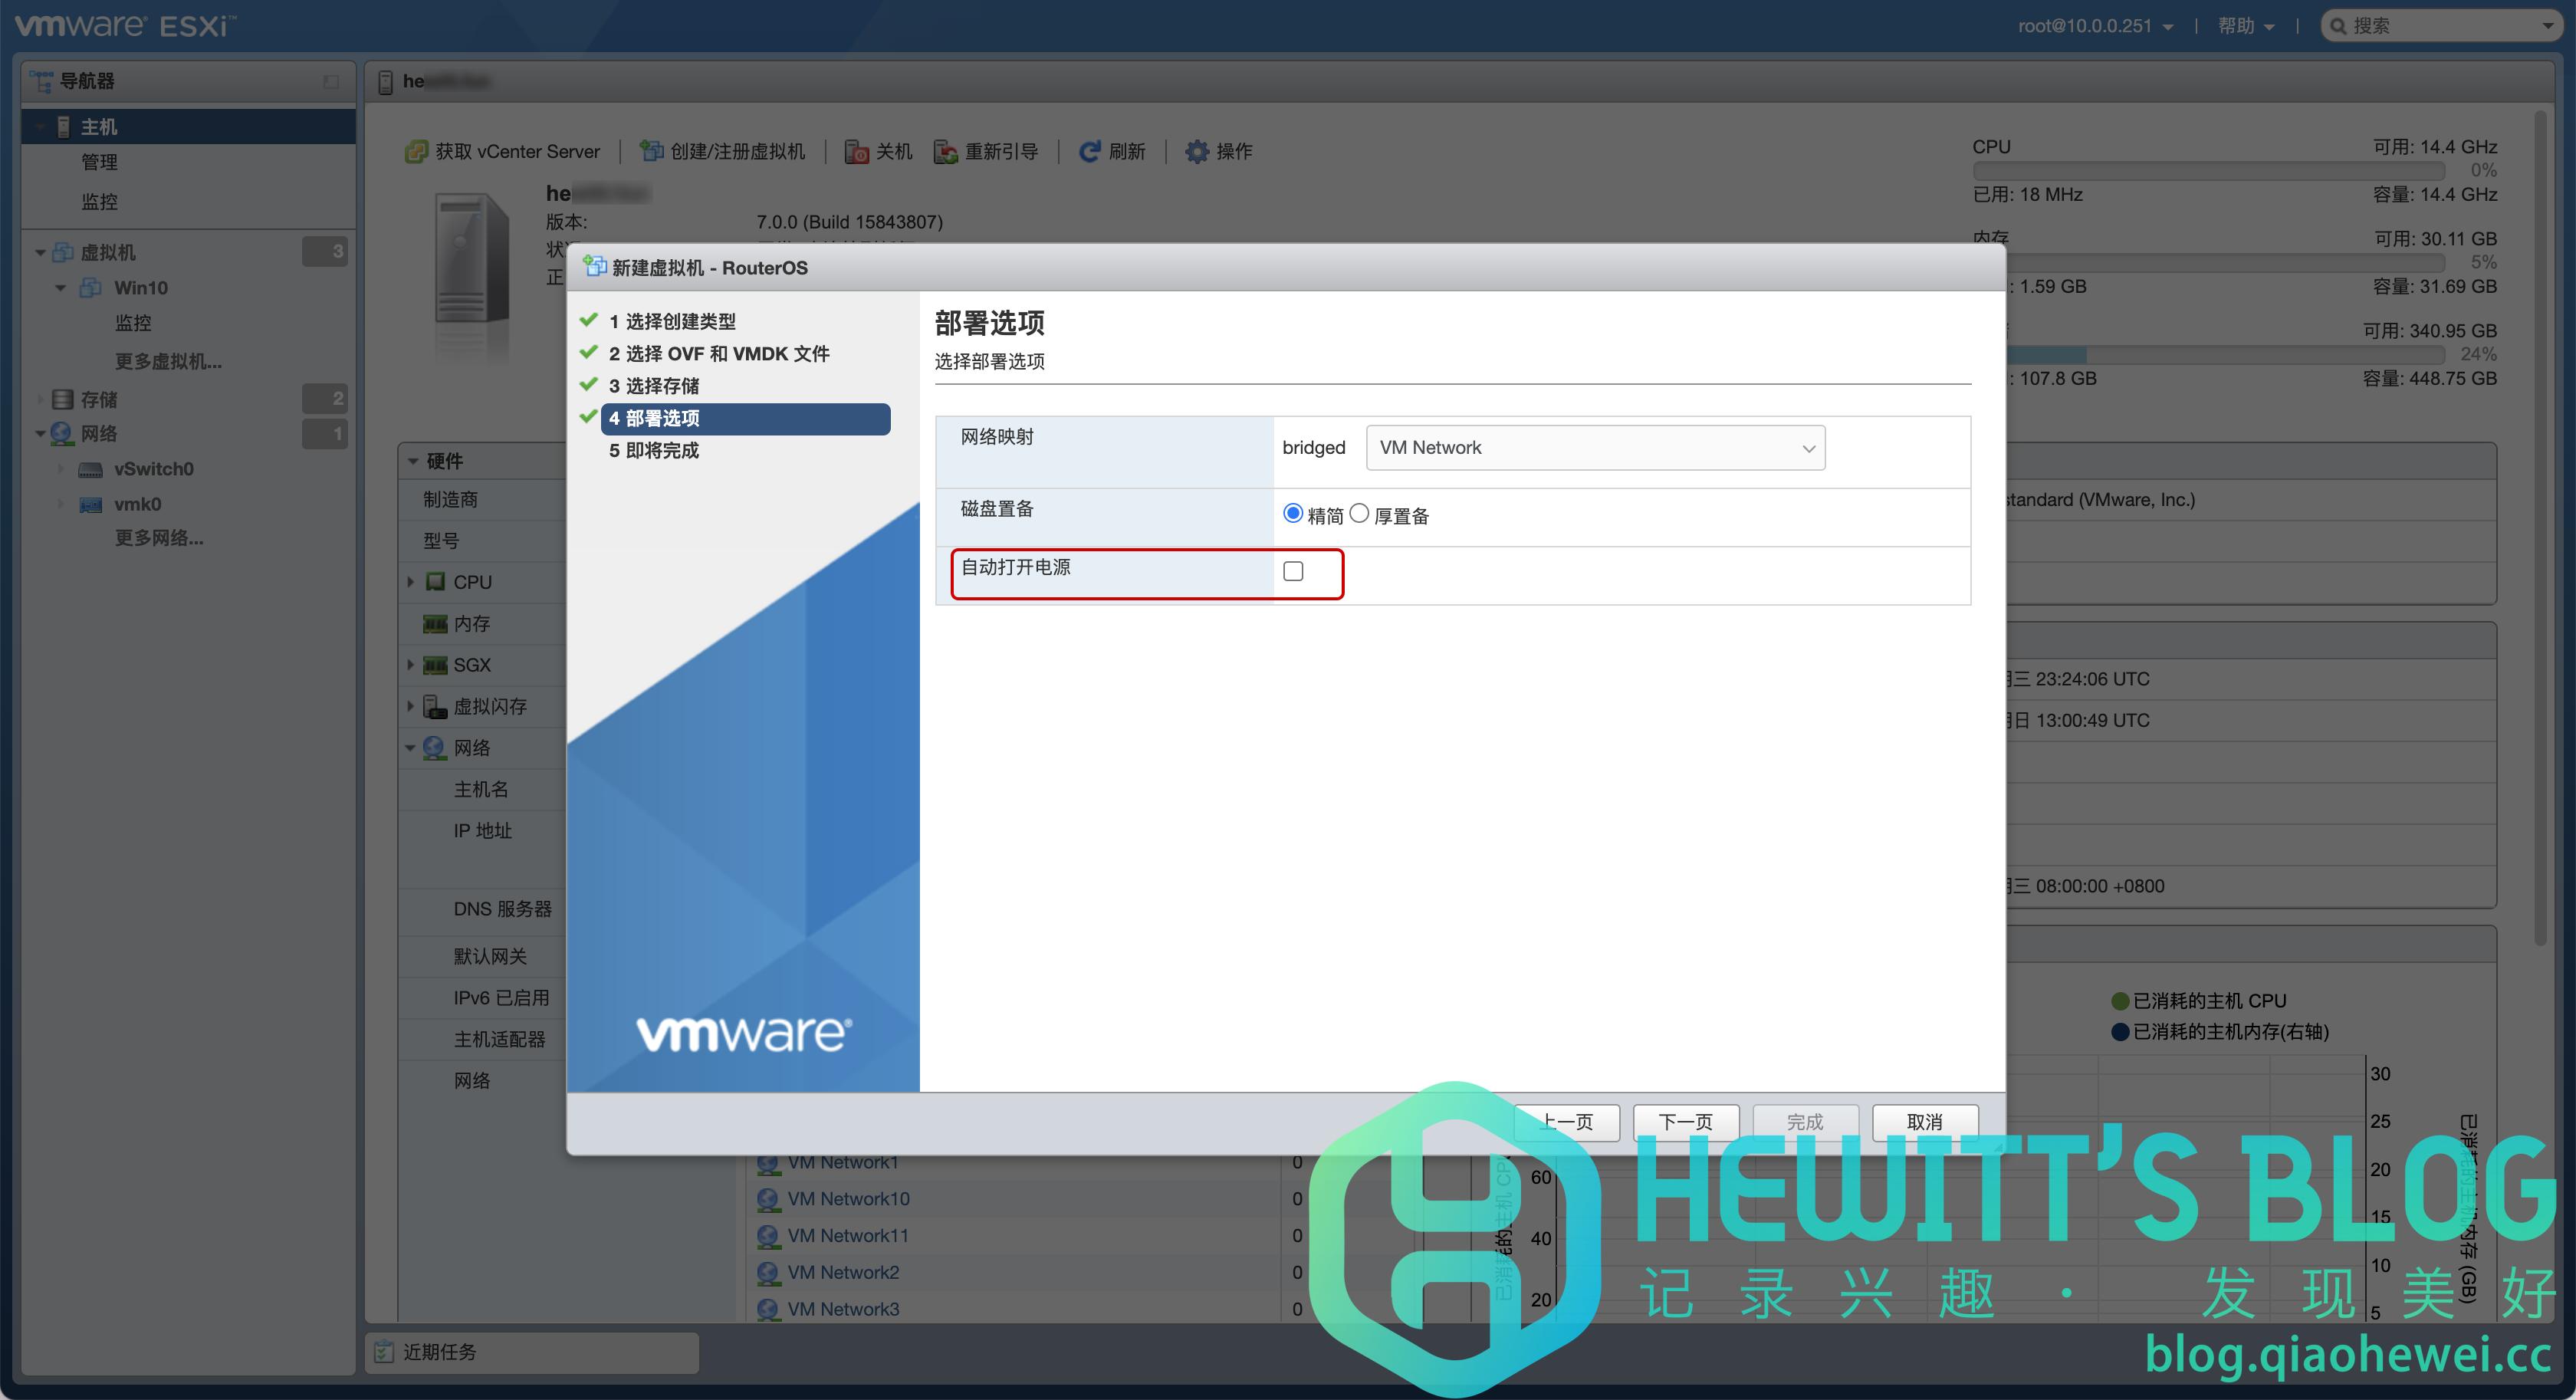 ESXI安装Mikrotik RouterOS(ROS)软路由部署指南(附授权镜像下载)插图19